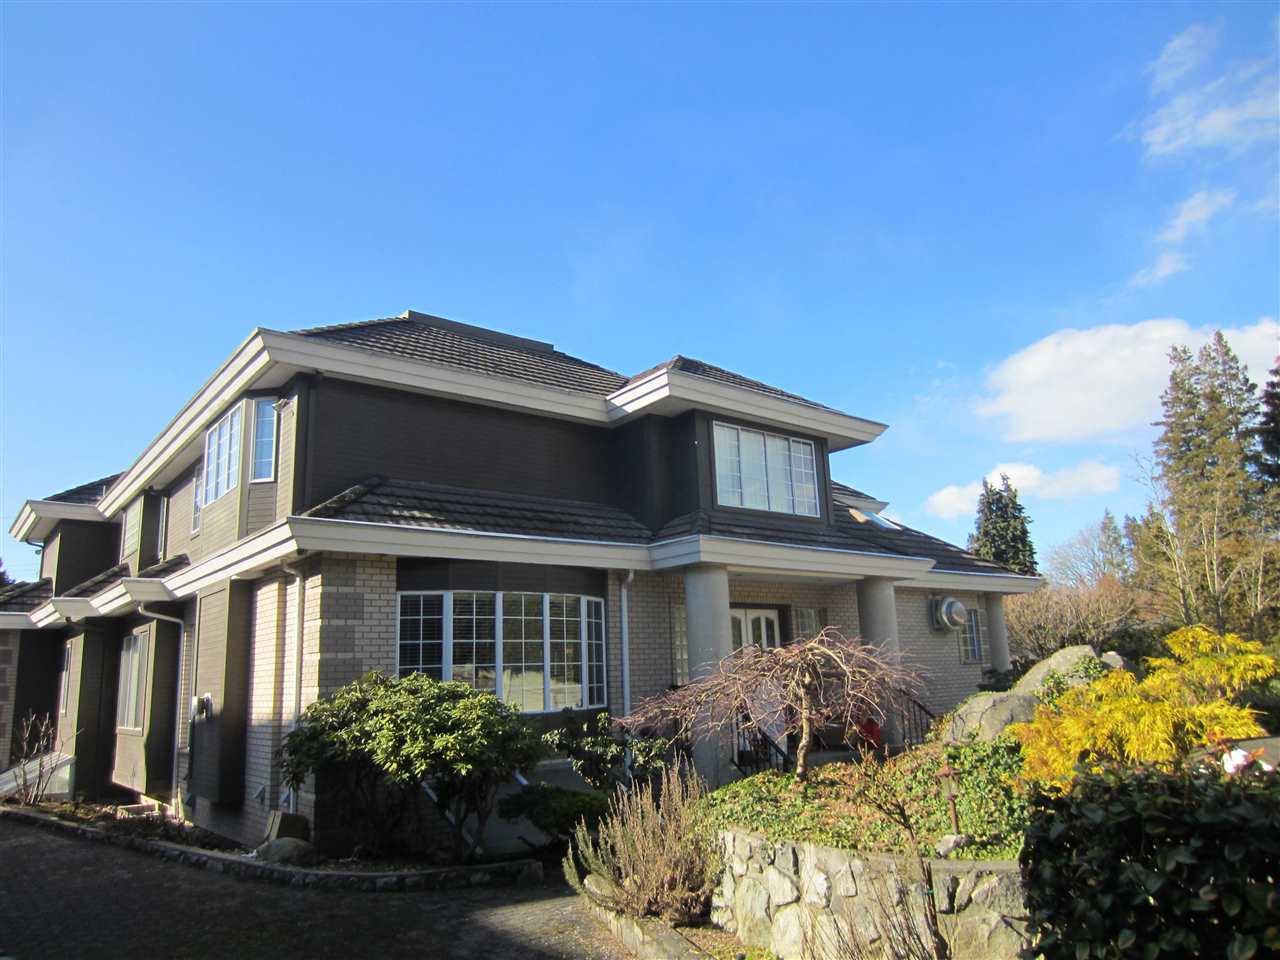 1520 W 32ND AVENUE, Vancouver, BC V6J 3A6